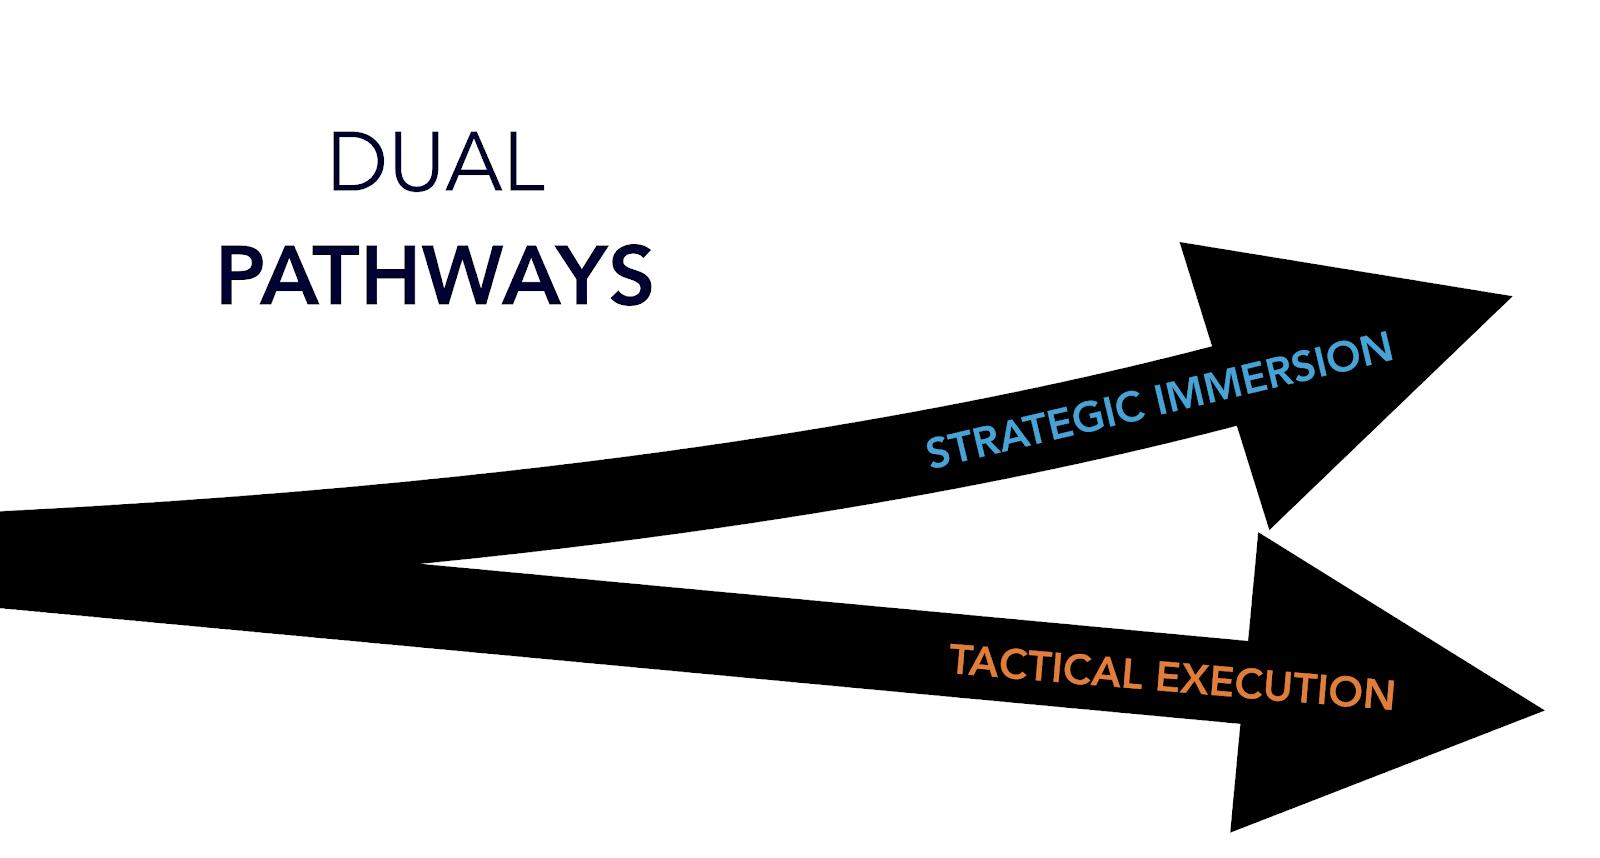 Dual pathways image